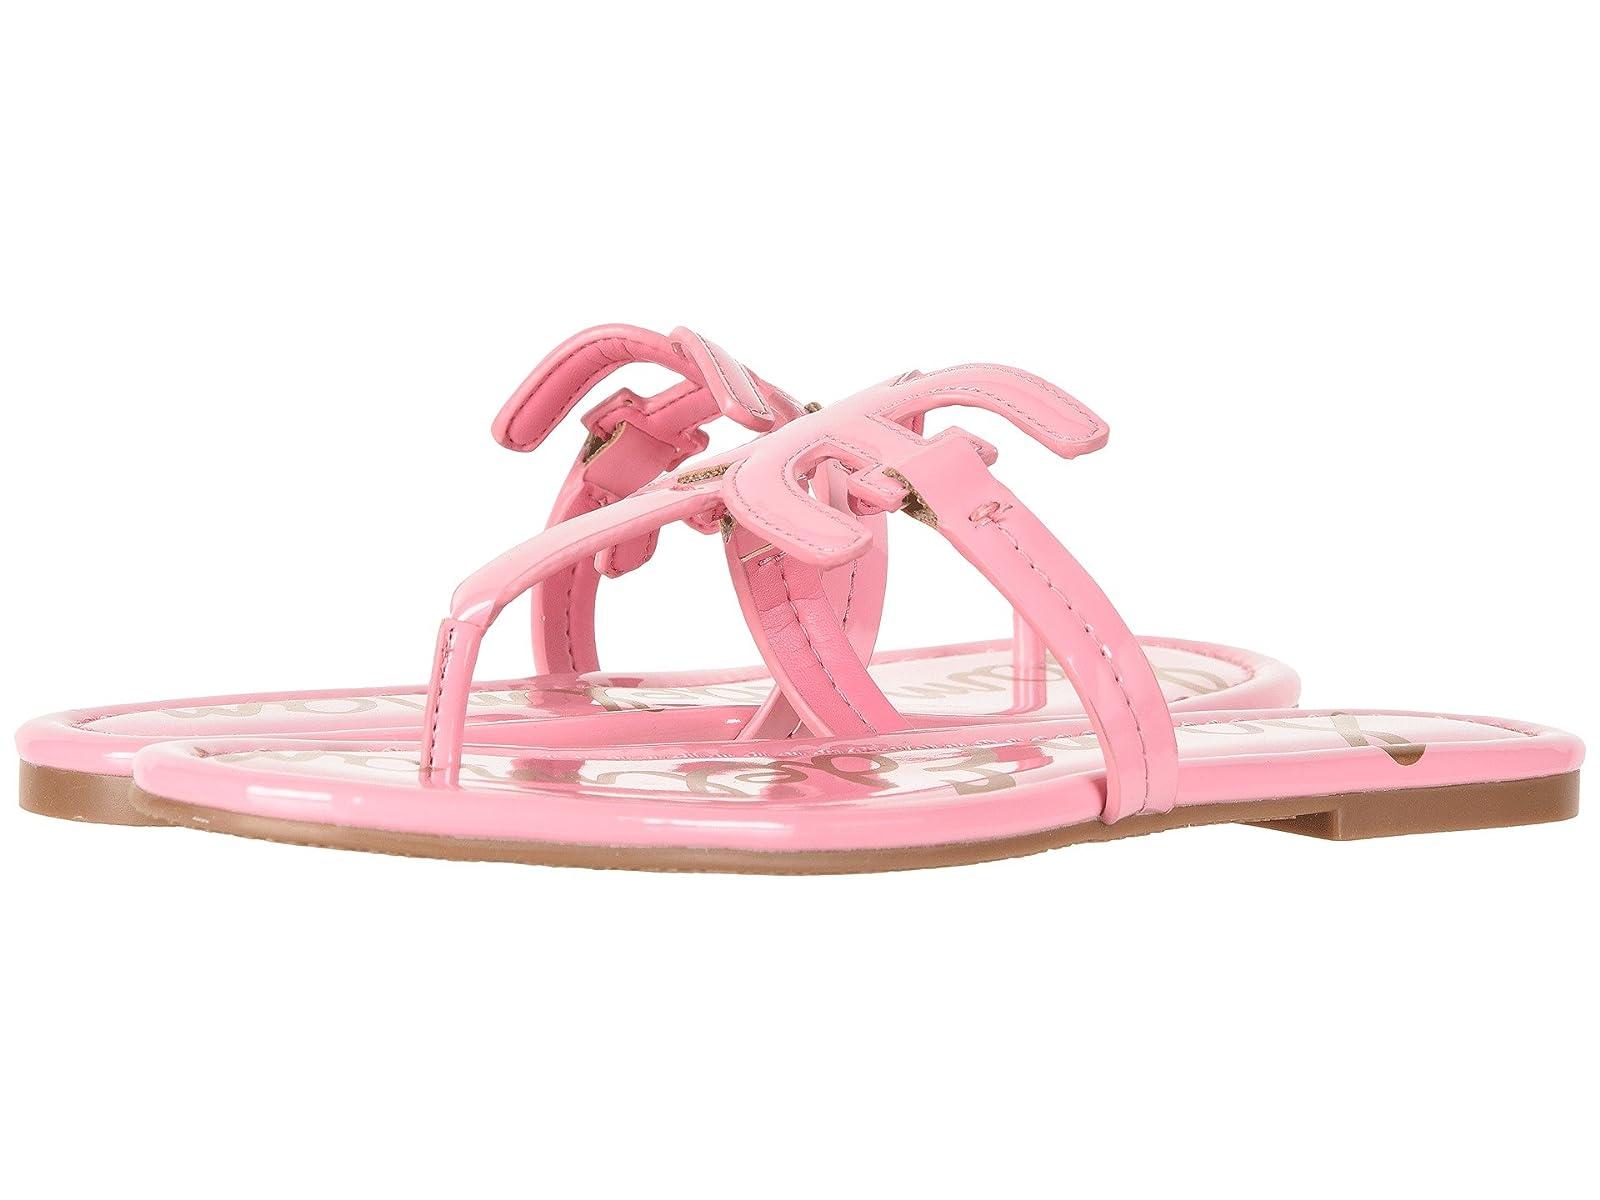 Sam Edelman CarterCheap and distinctive eye-catching shoes